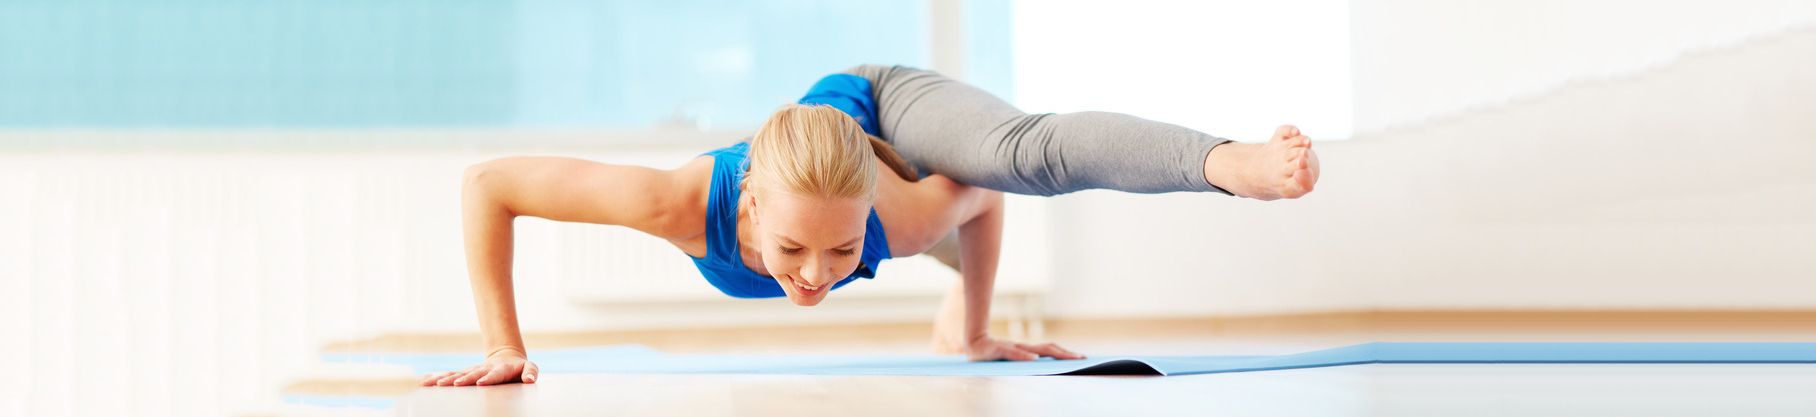 YogaFit Strength - Yoga Fit